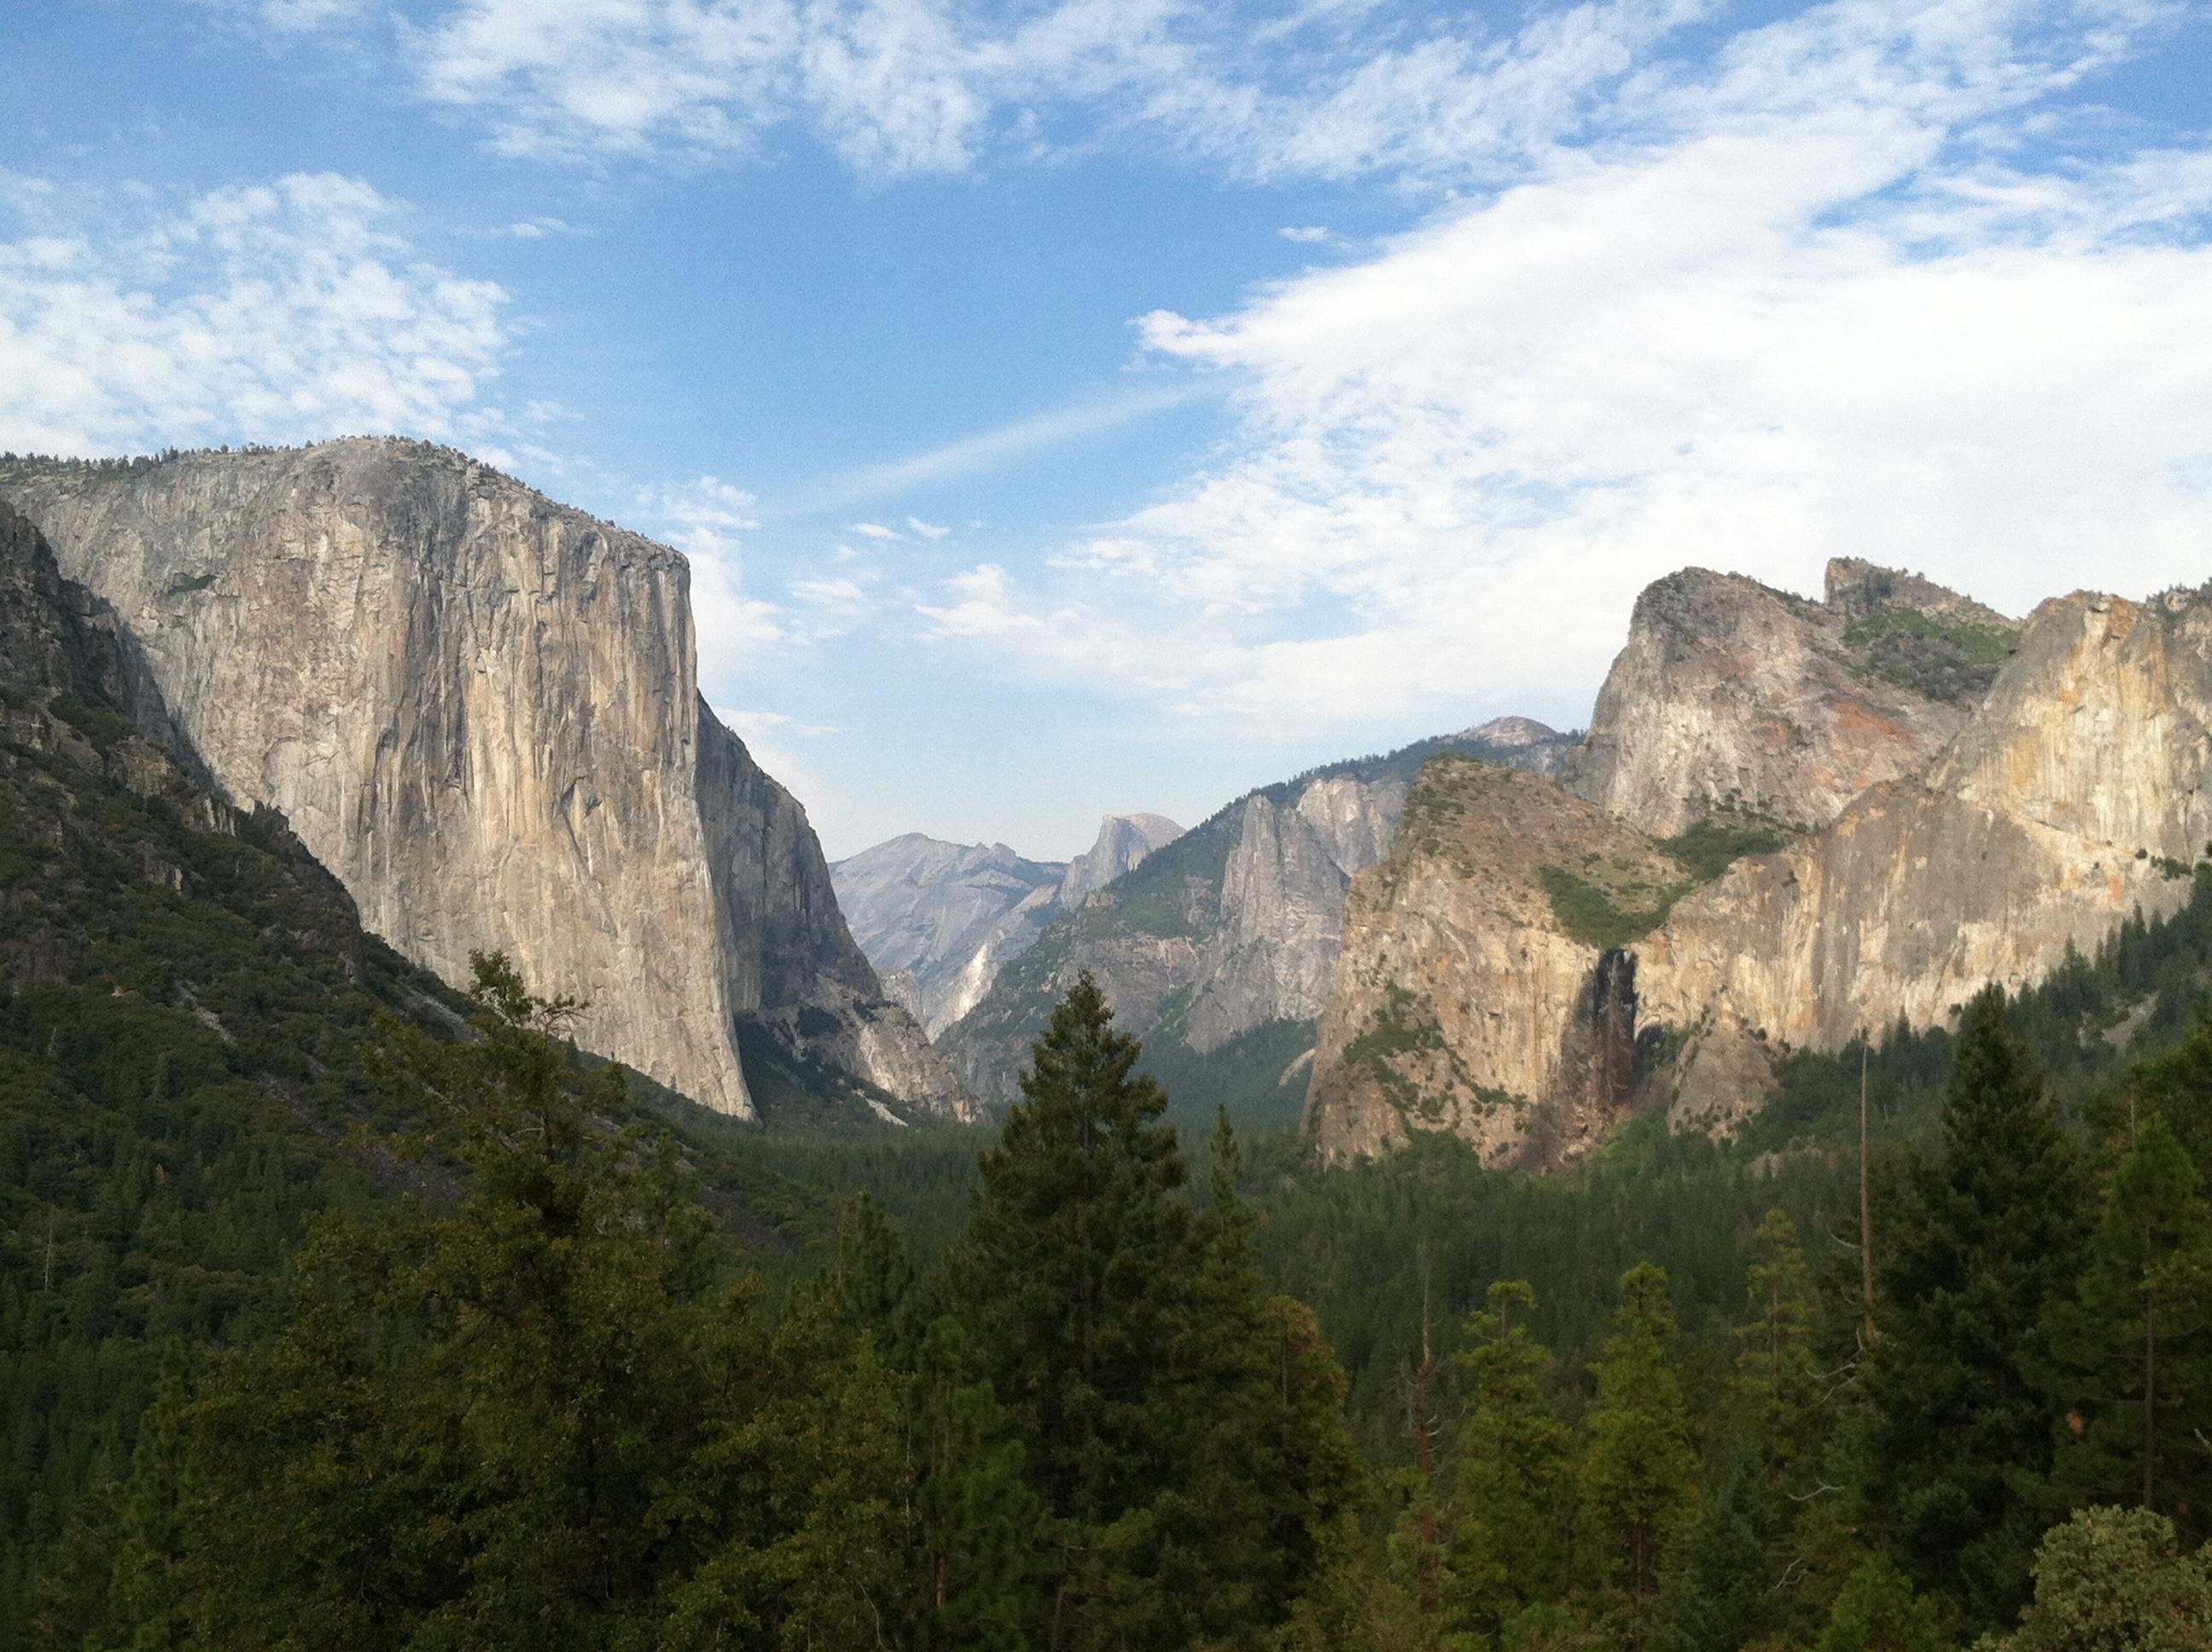 Yosemite National Park Part 2 Yosemite Valley And Glacier